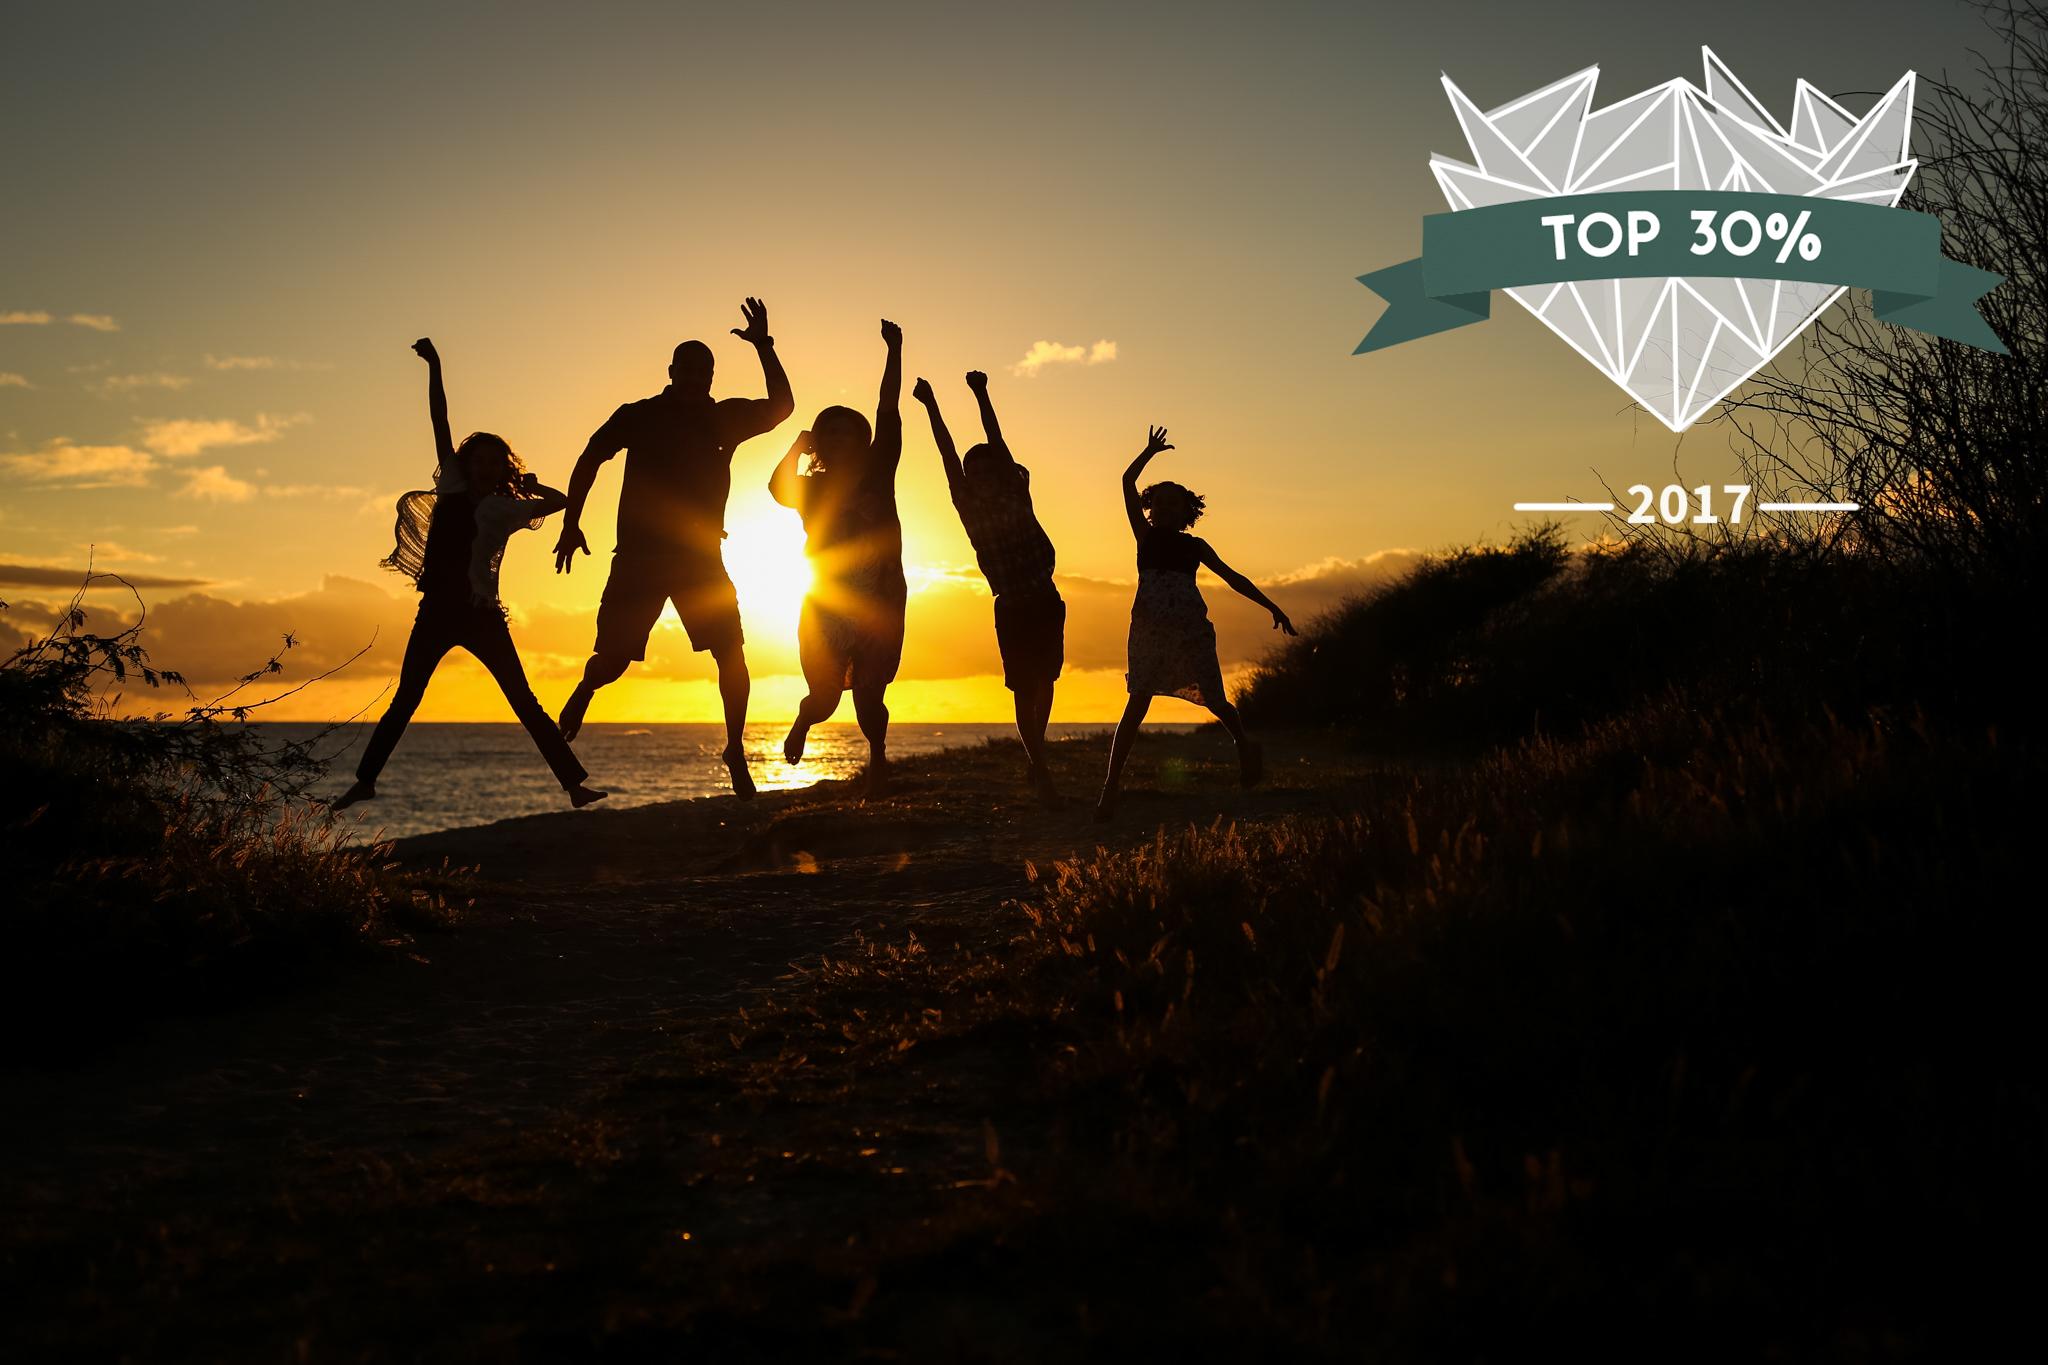 non watermarked 2017 shoot and share photo awards aloha sunshine photography 4January 07, 2017.jpg